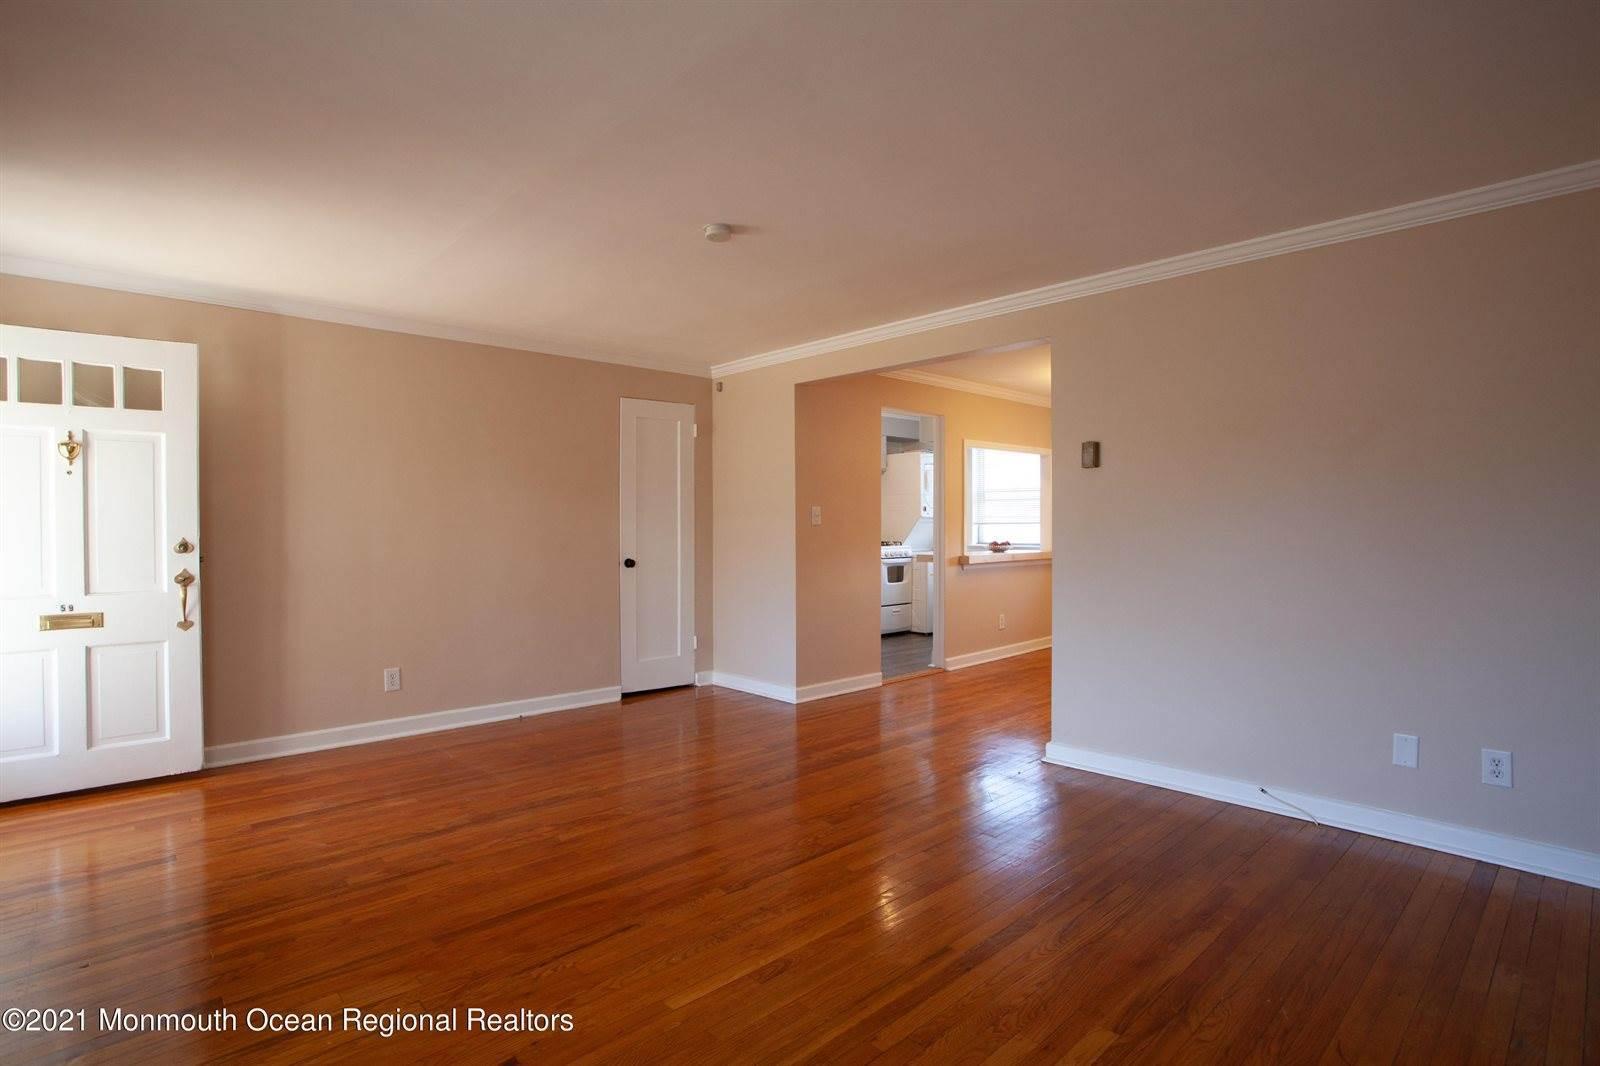 59 Manor Drive, Red Bank, NJ 07701